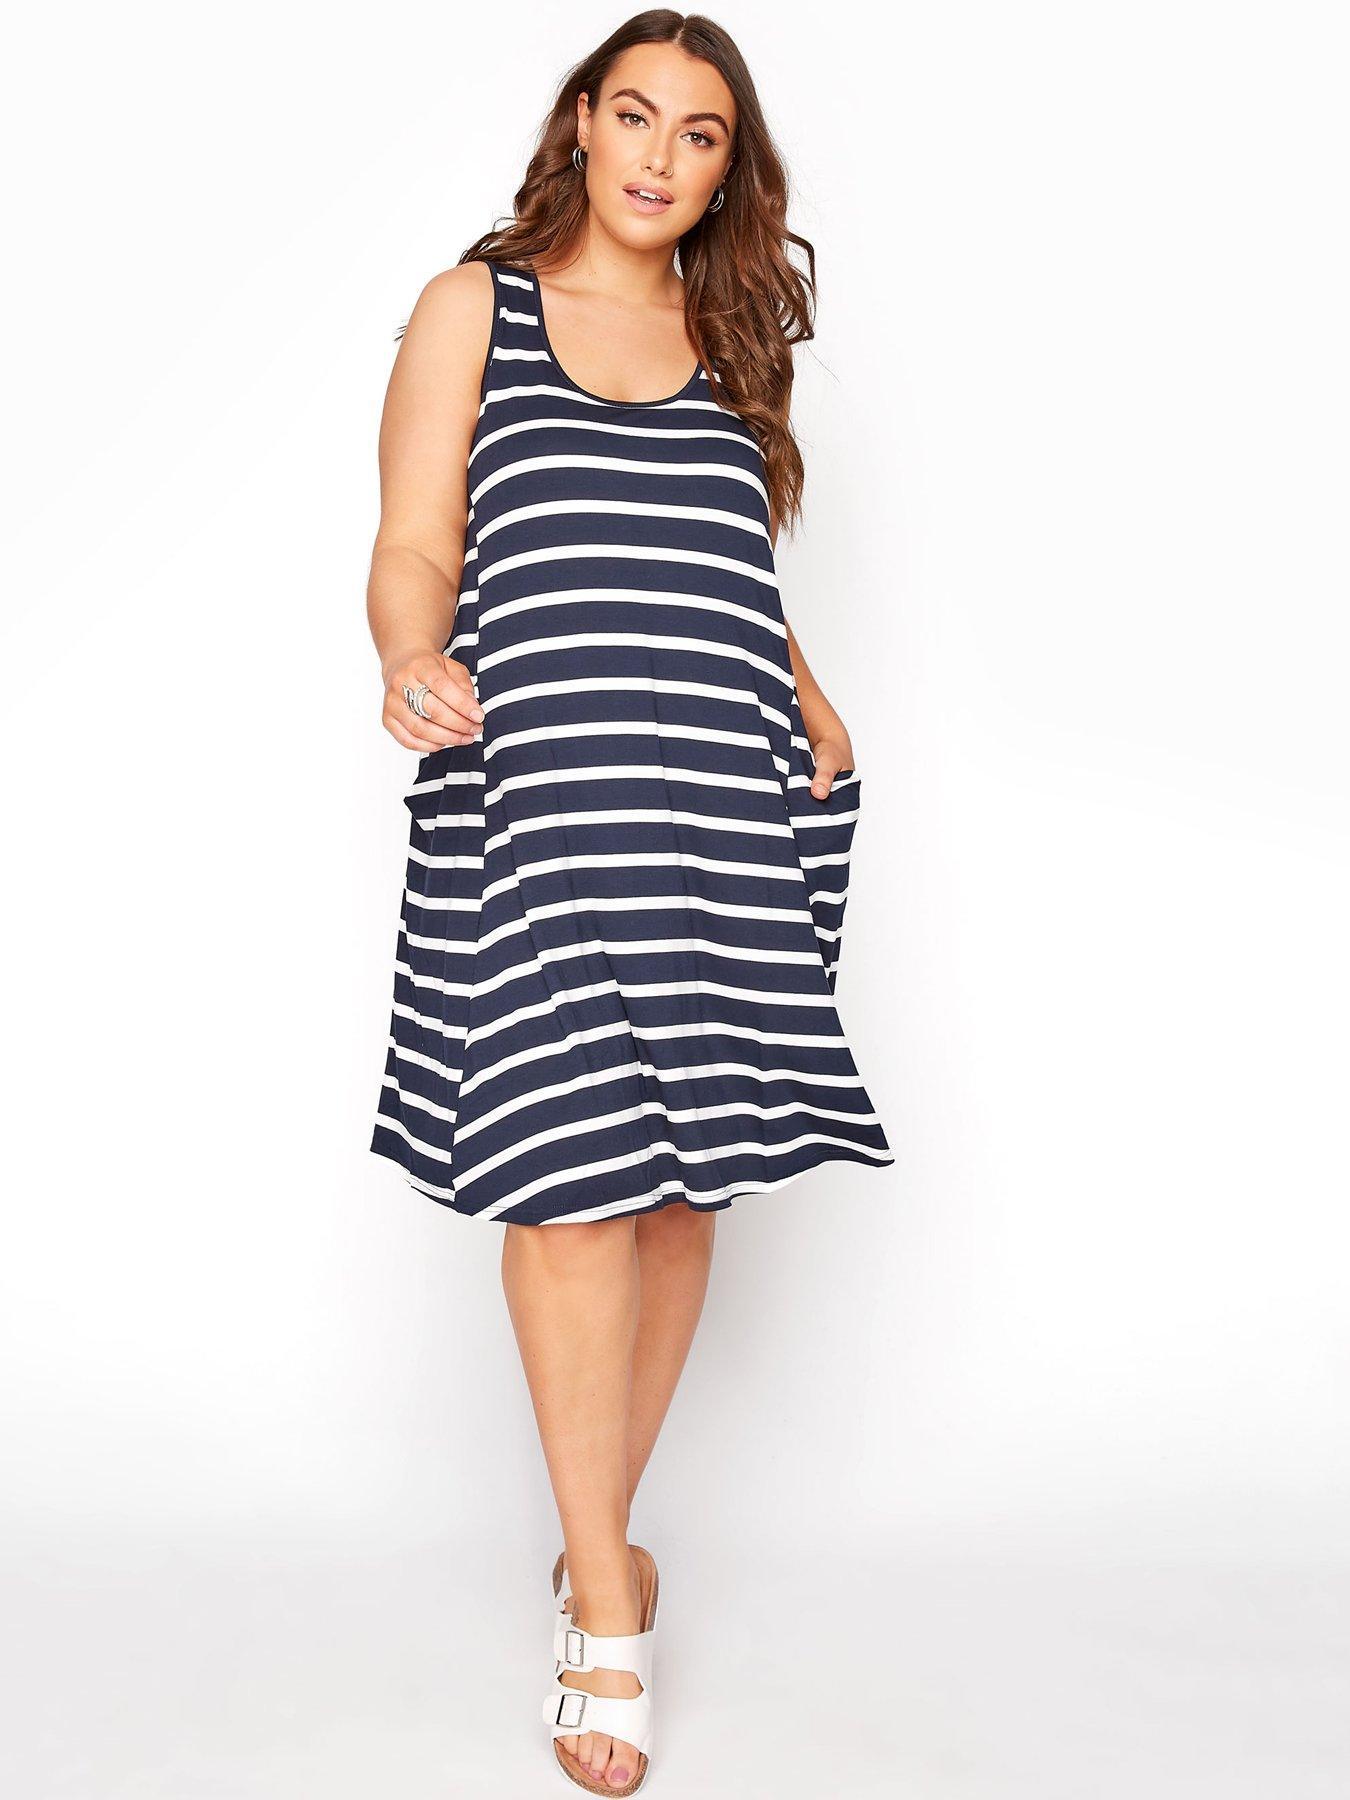 Details about  /Fluid Summer Rib Dress /'Hot Pink/' Cotton Size 8